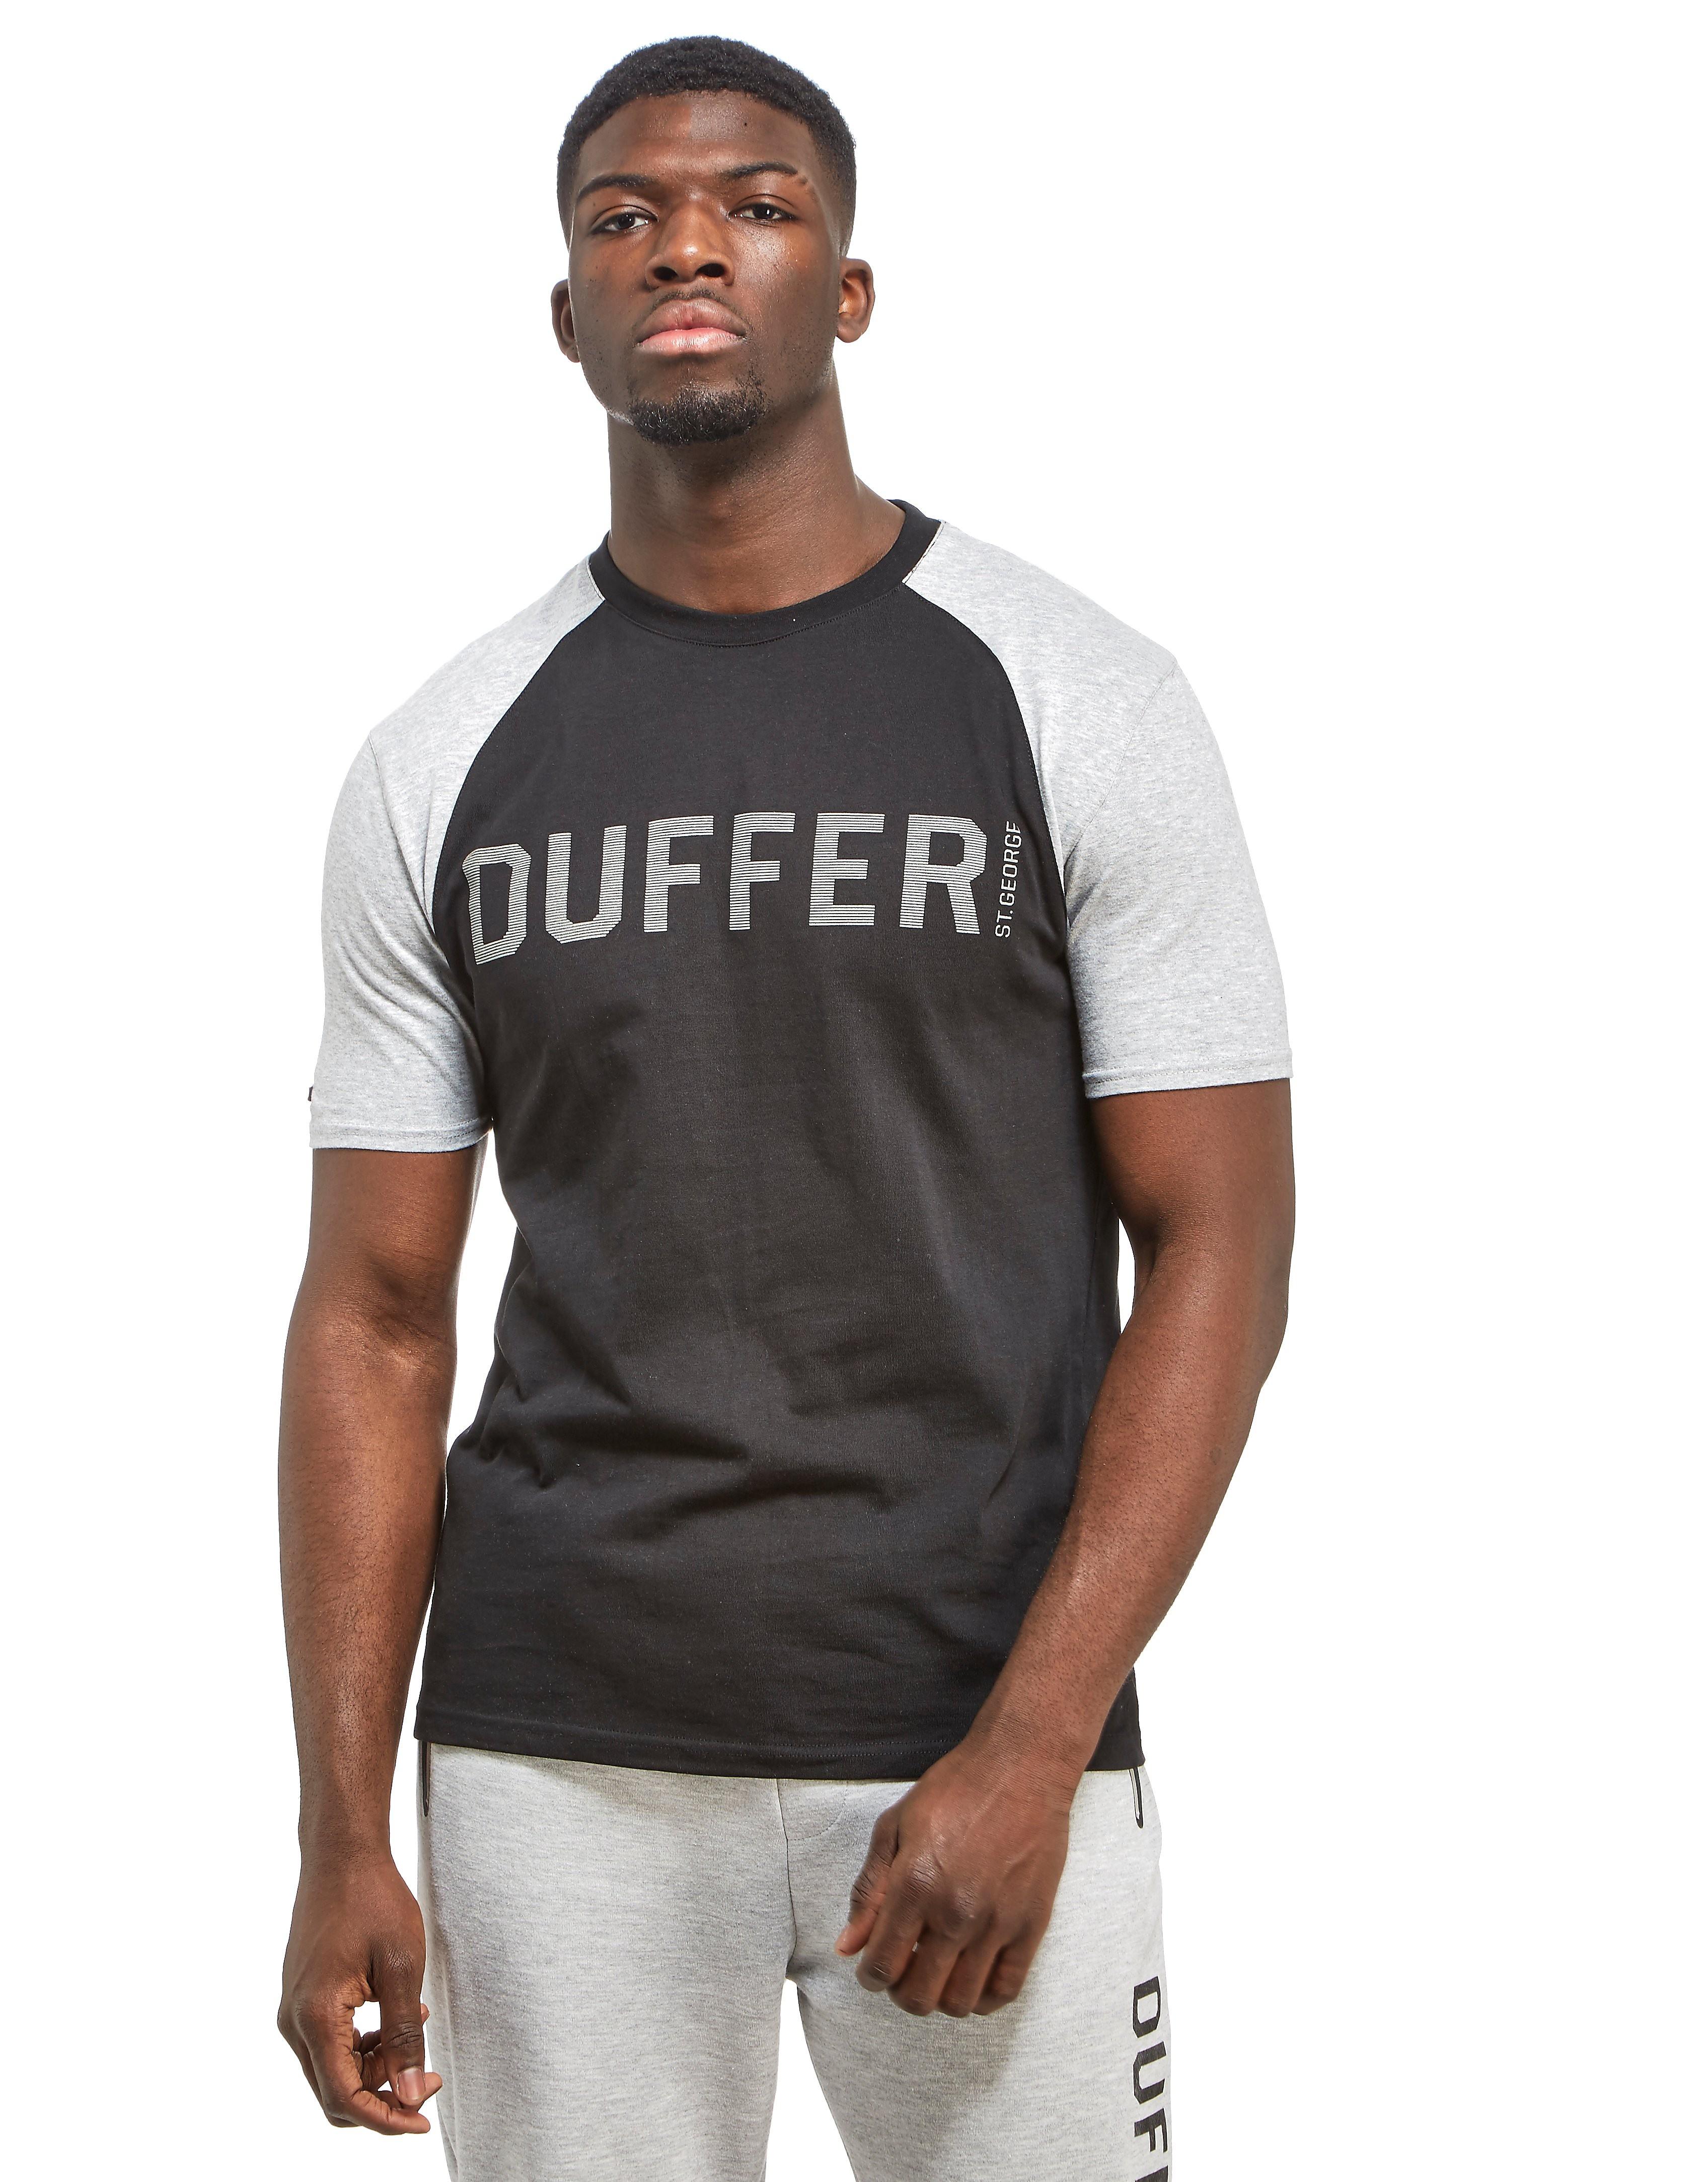 Duffer of St George Raglan T-Shirt